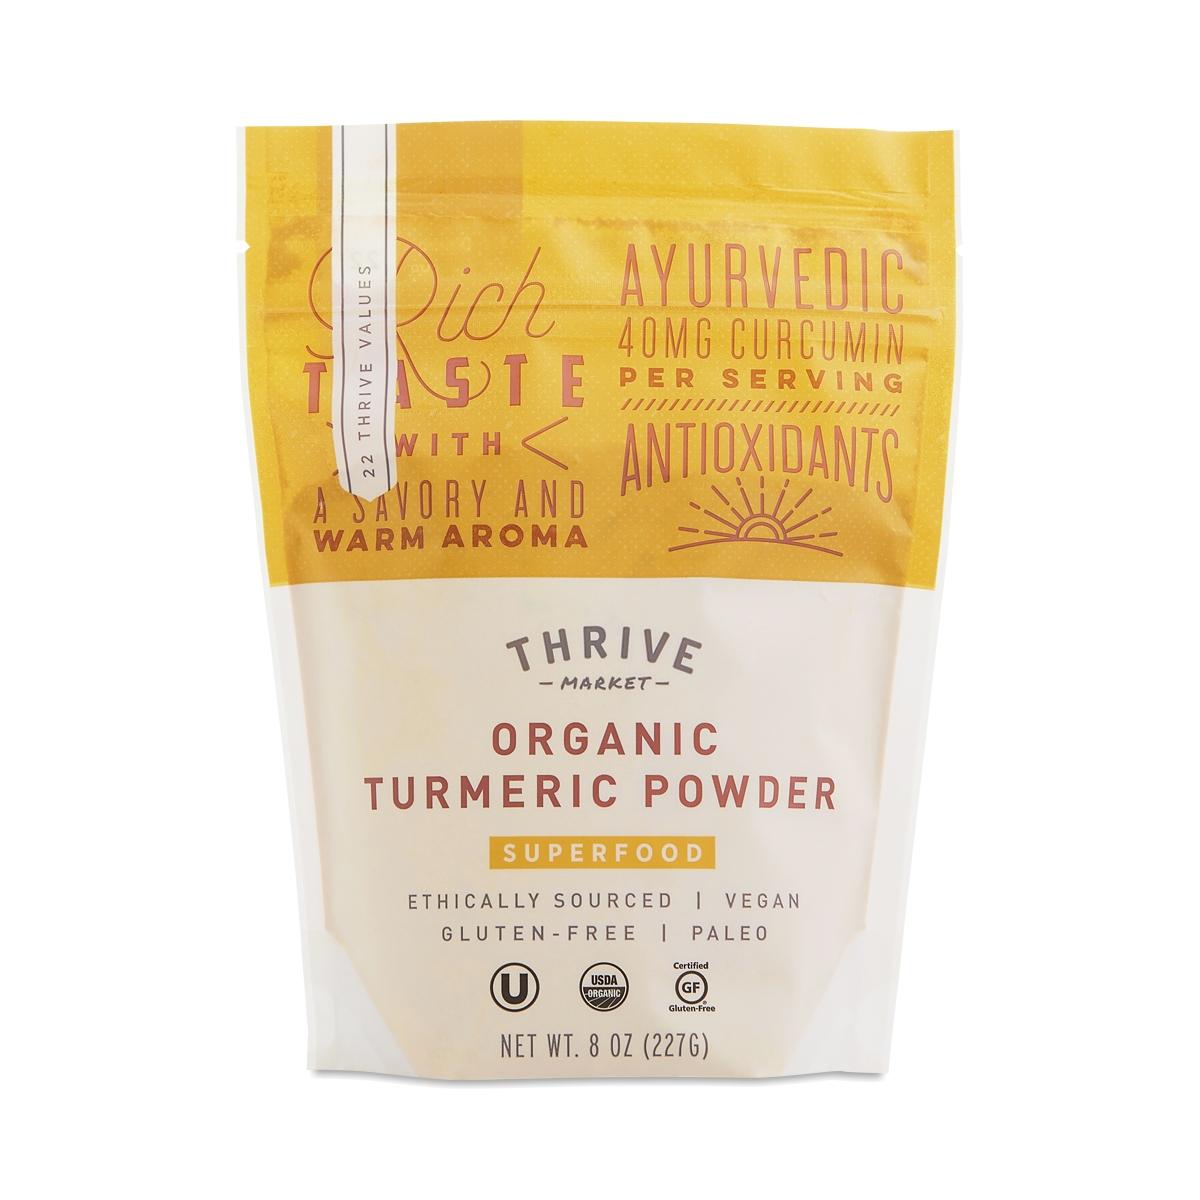 Thrive Market Organic Turmeric Powder 8 oz bag